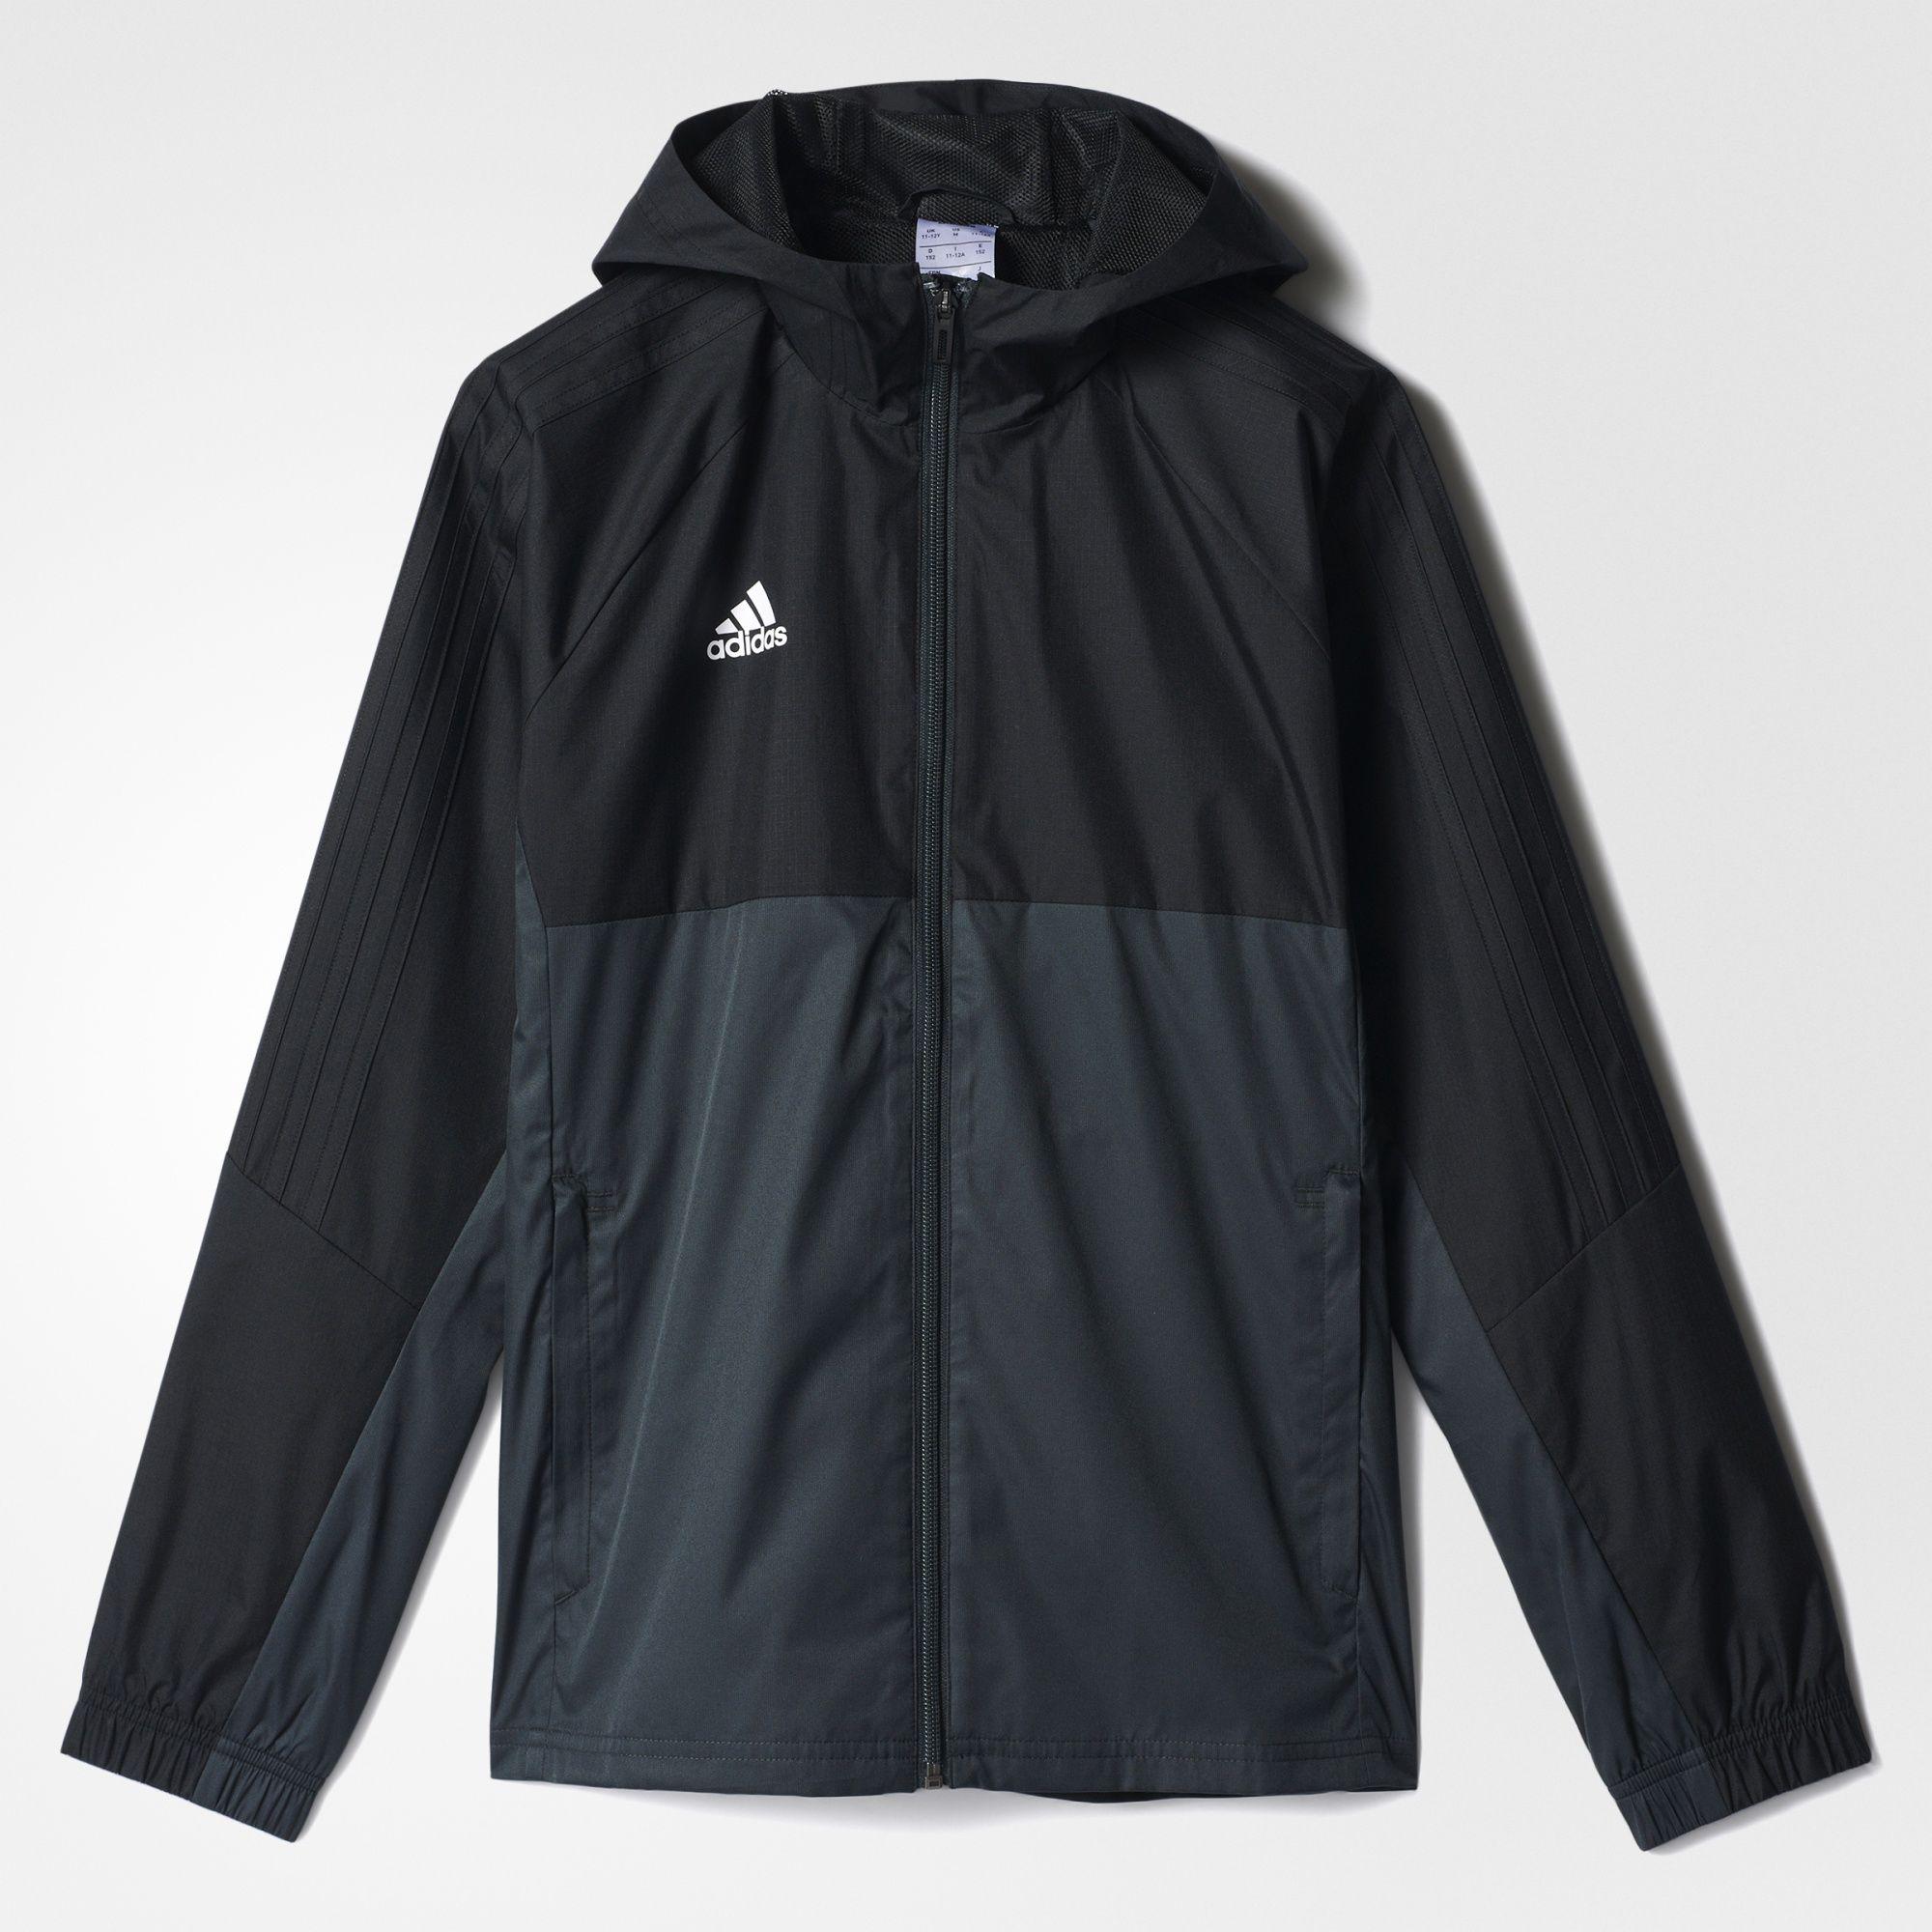 ffdf5ec7 Куртка Tiro17 Rain K AY2888 adidas Performance - Украина | ONETEAM ...